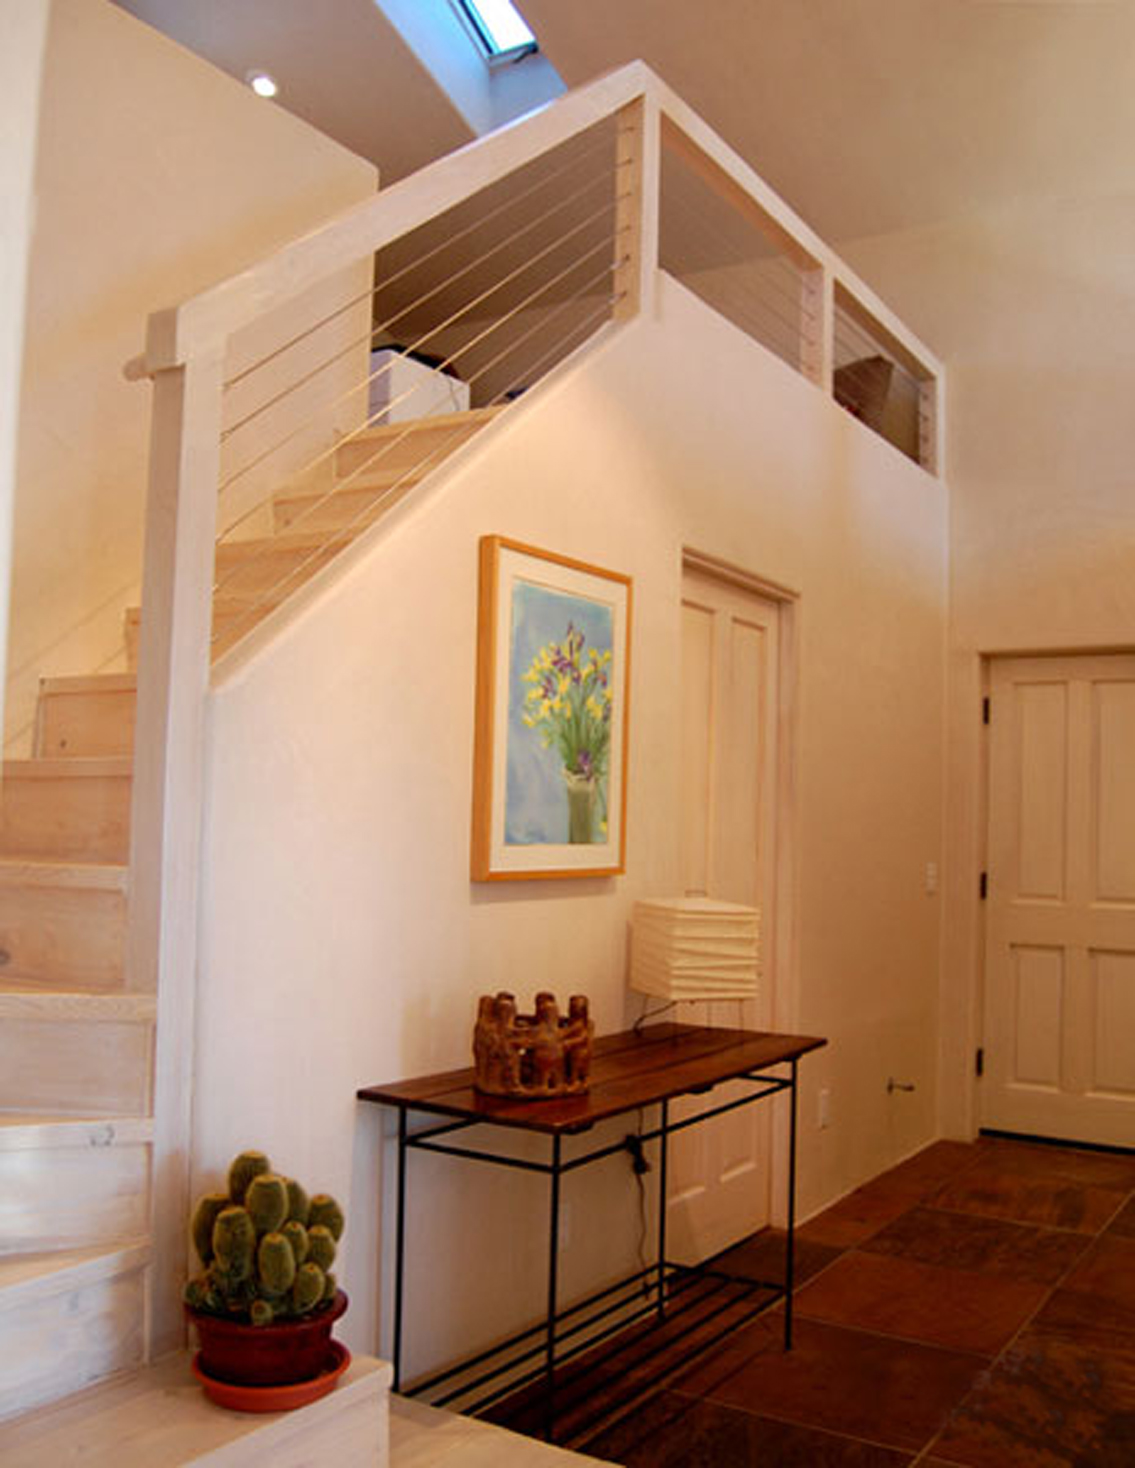 Luna Trust - Entry Hall